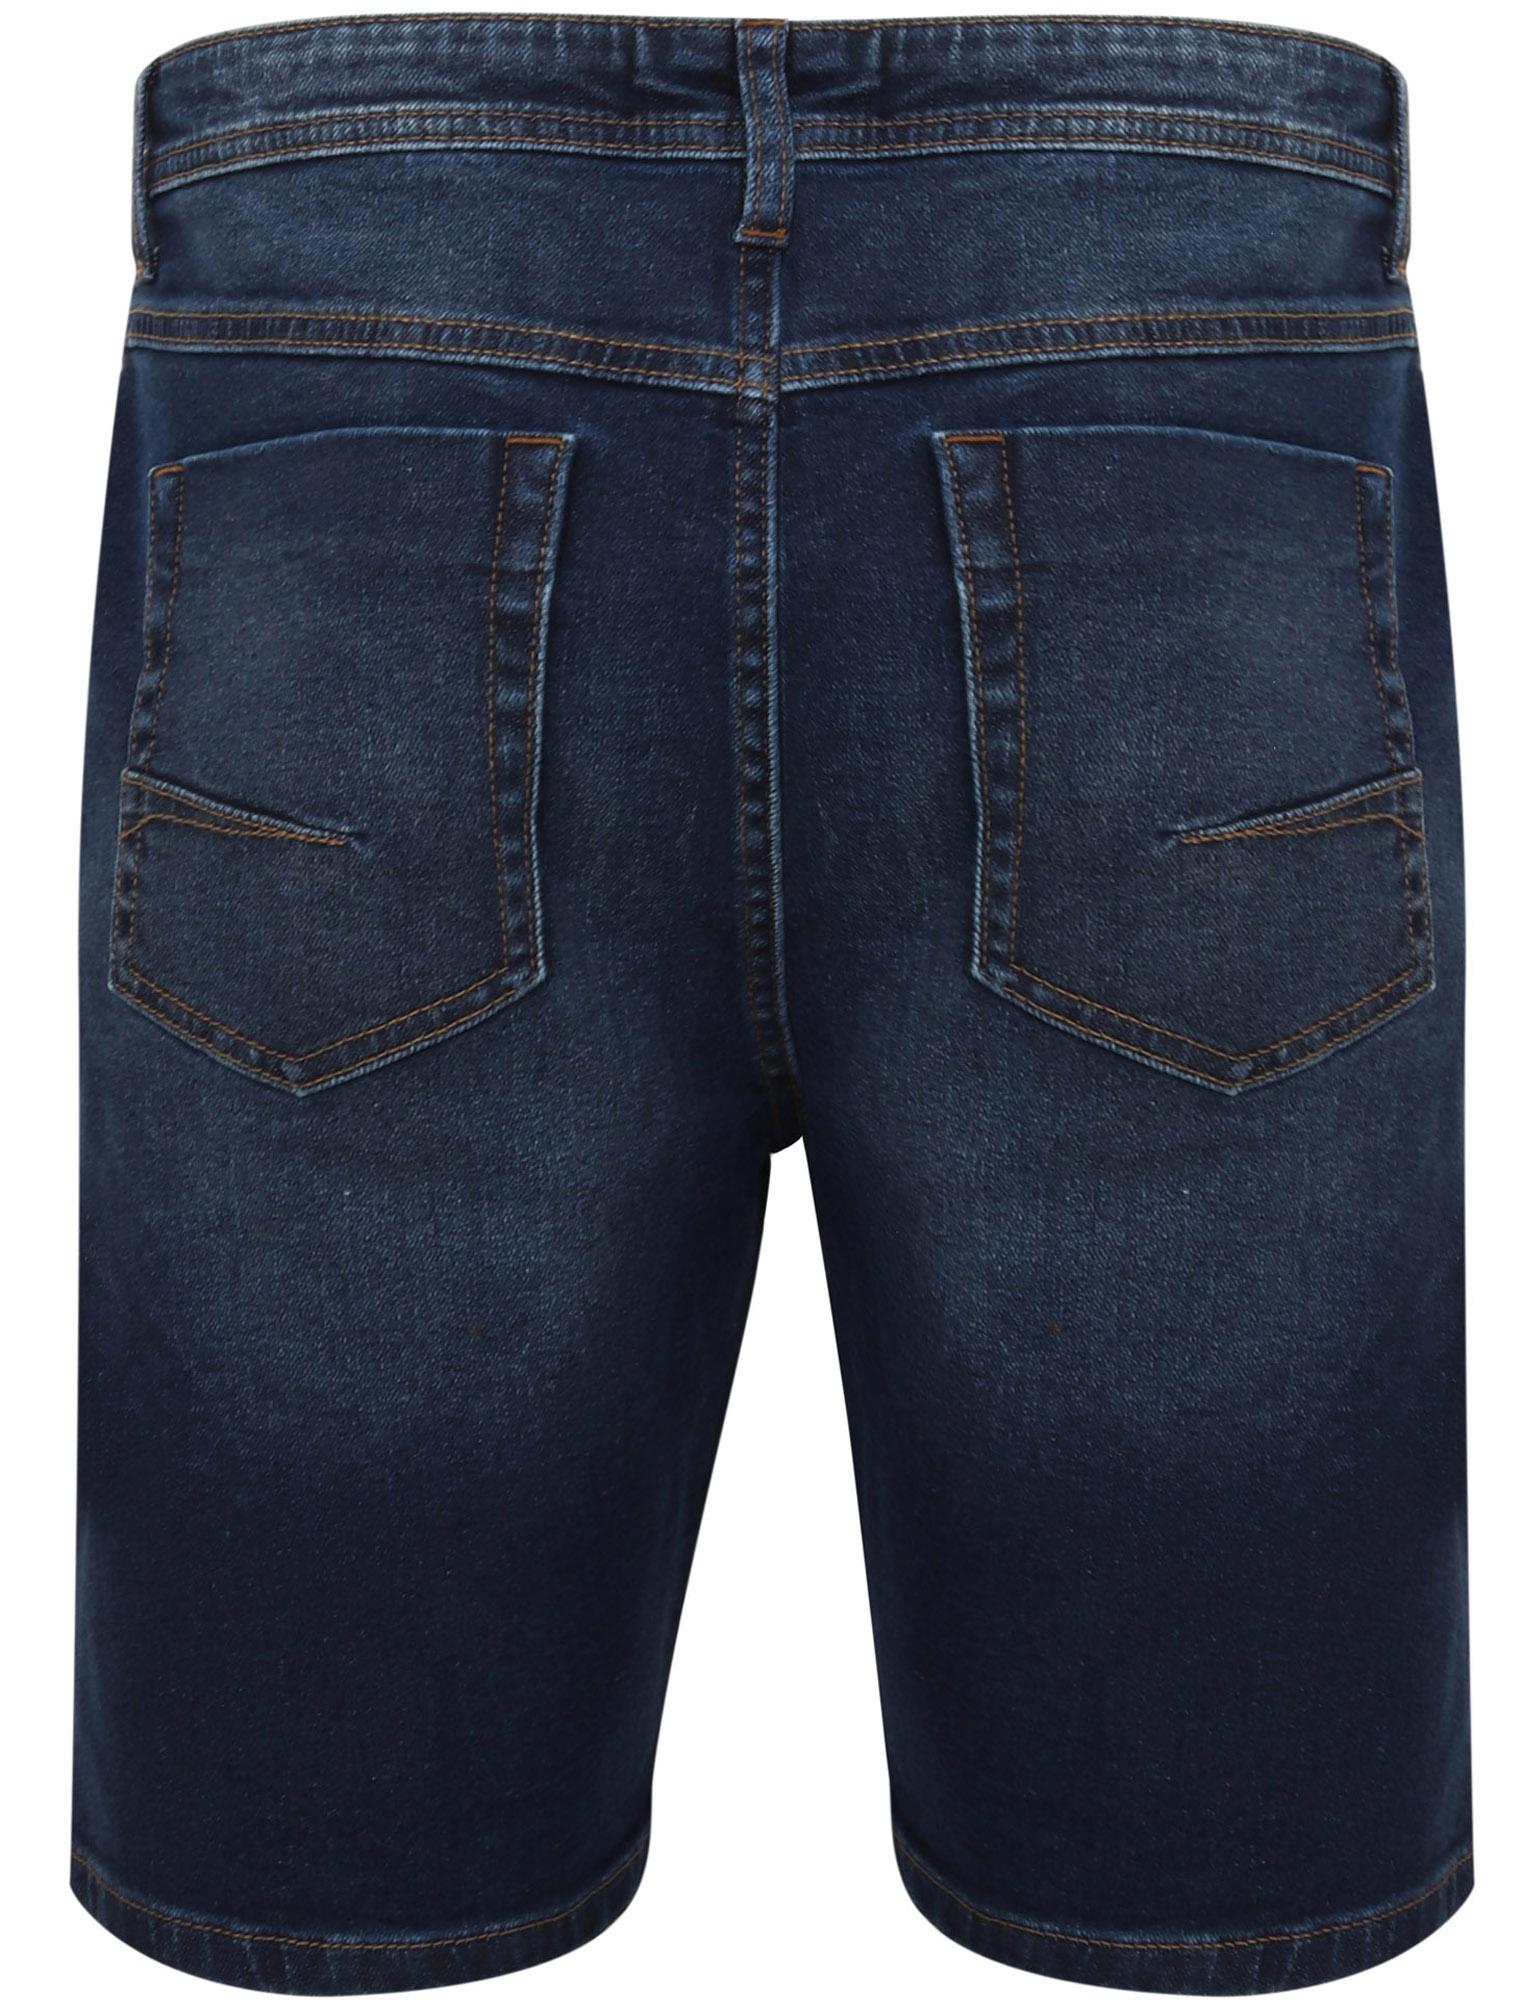 Tokyo-Laundry-Mens-Stretch-Denim-Shorts-Chino-Jean-Vintage-Dark-Light-Wash-Slim thumbnail 11